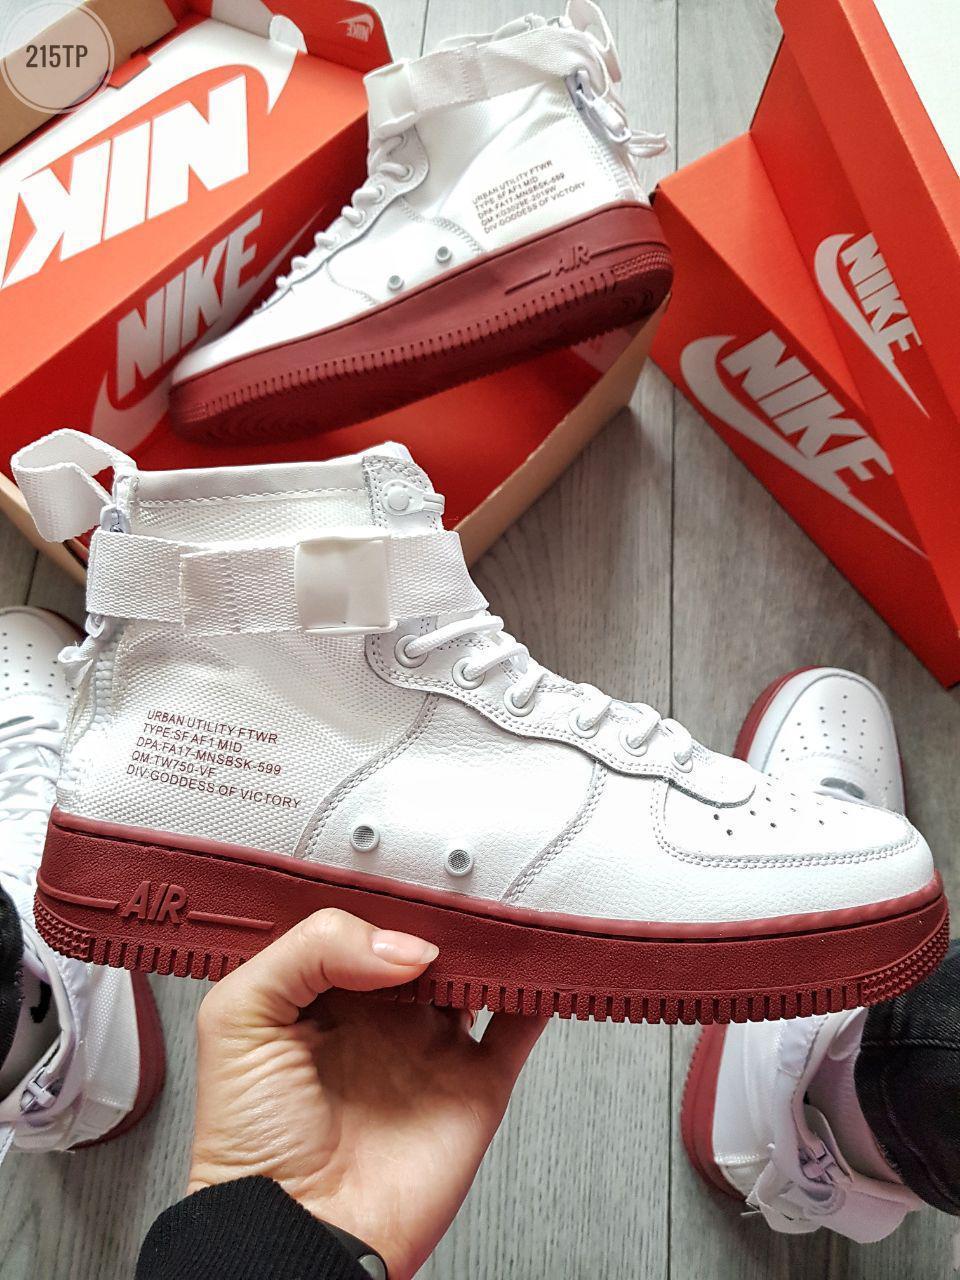 Мужские кроссовки Nike Air Force Hight Utility Gum (р. 41 43 44) Белые